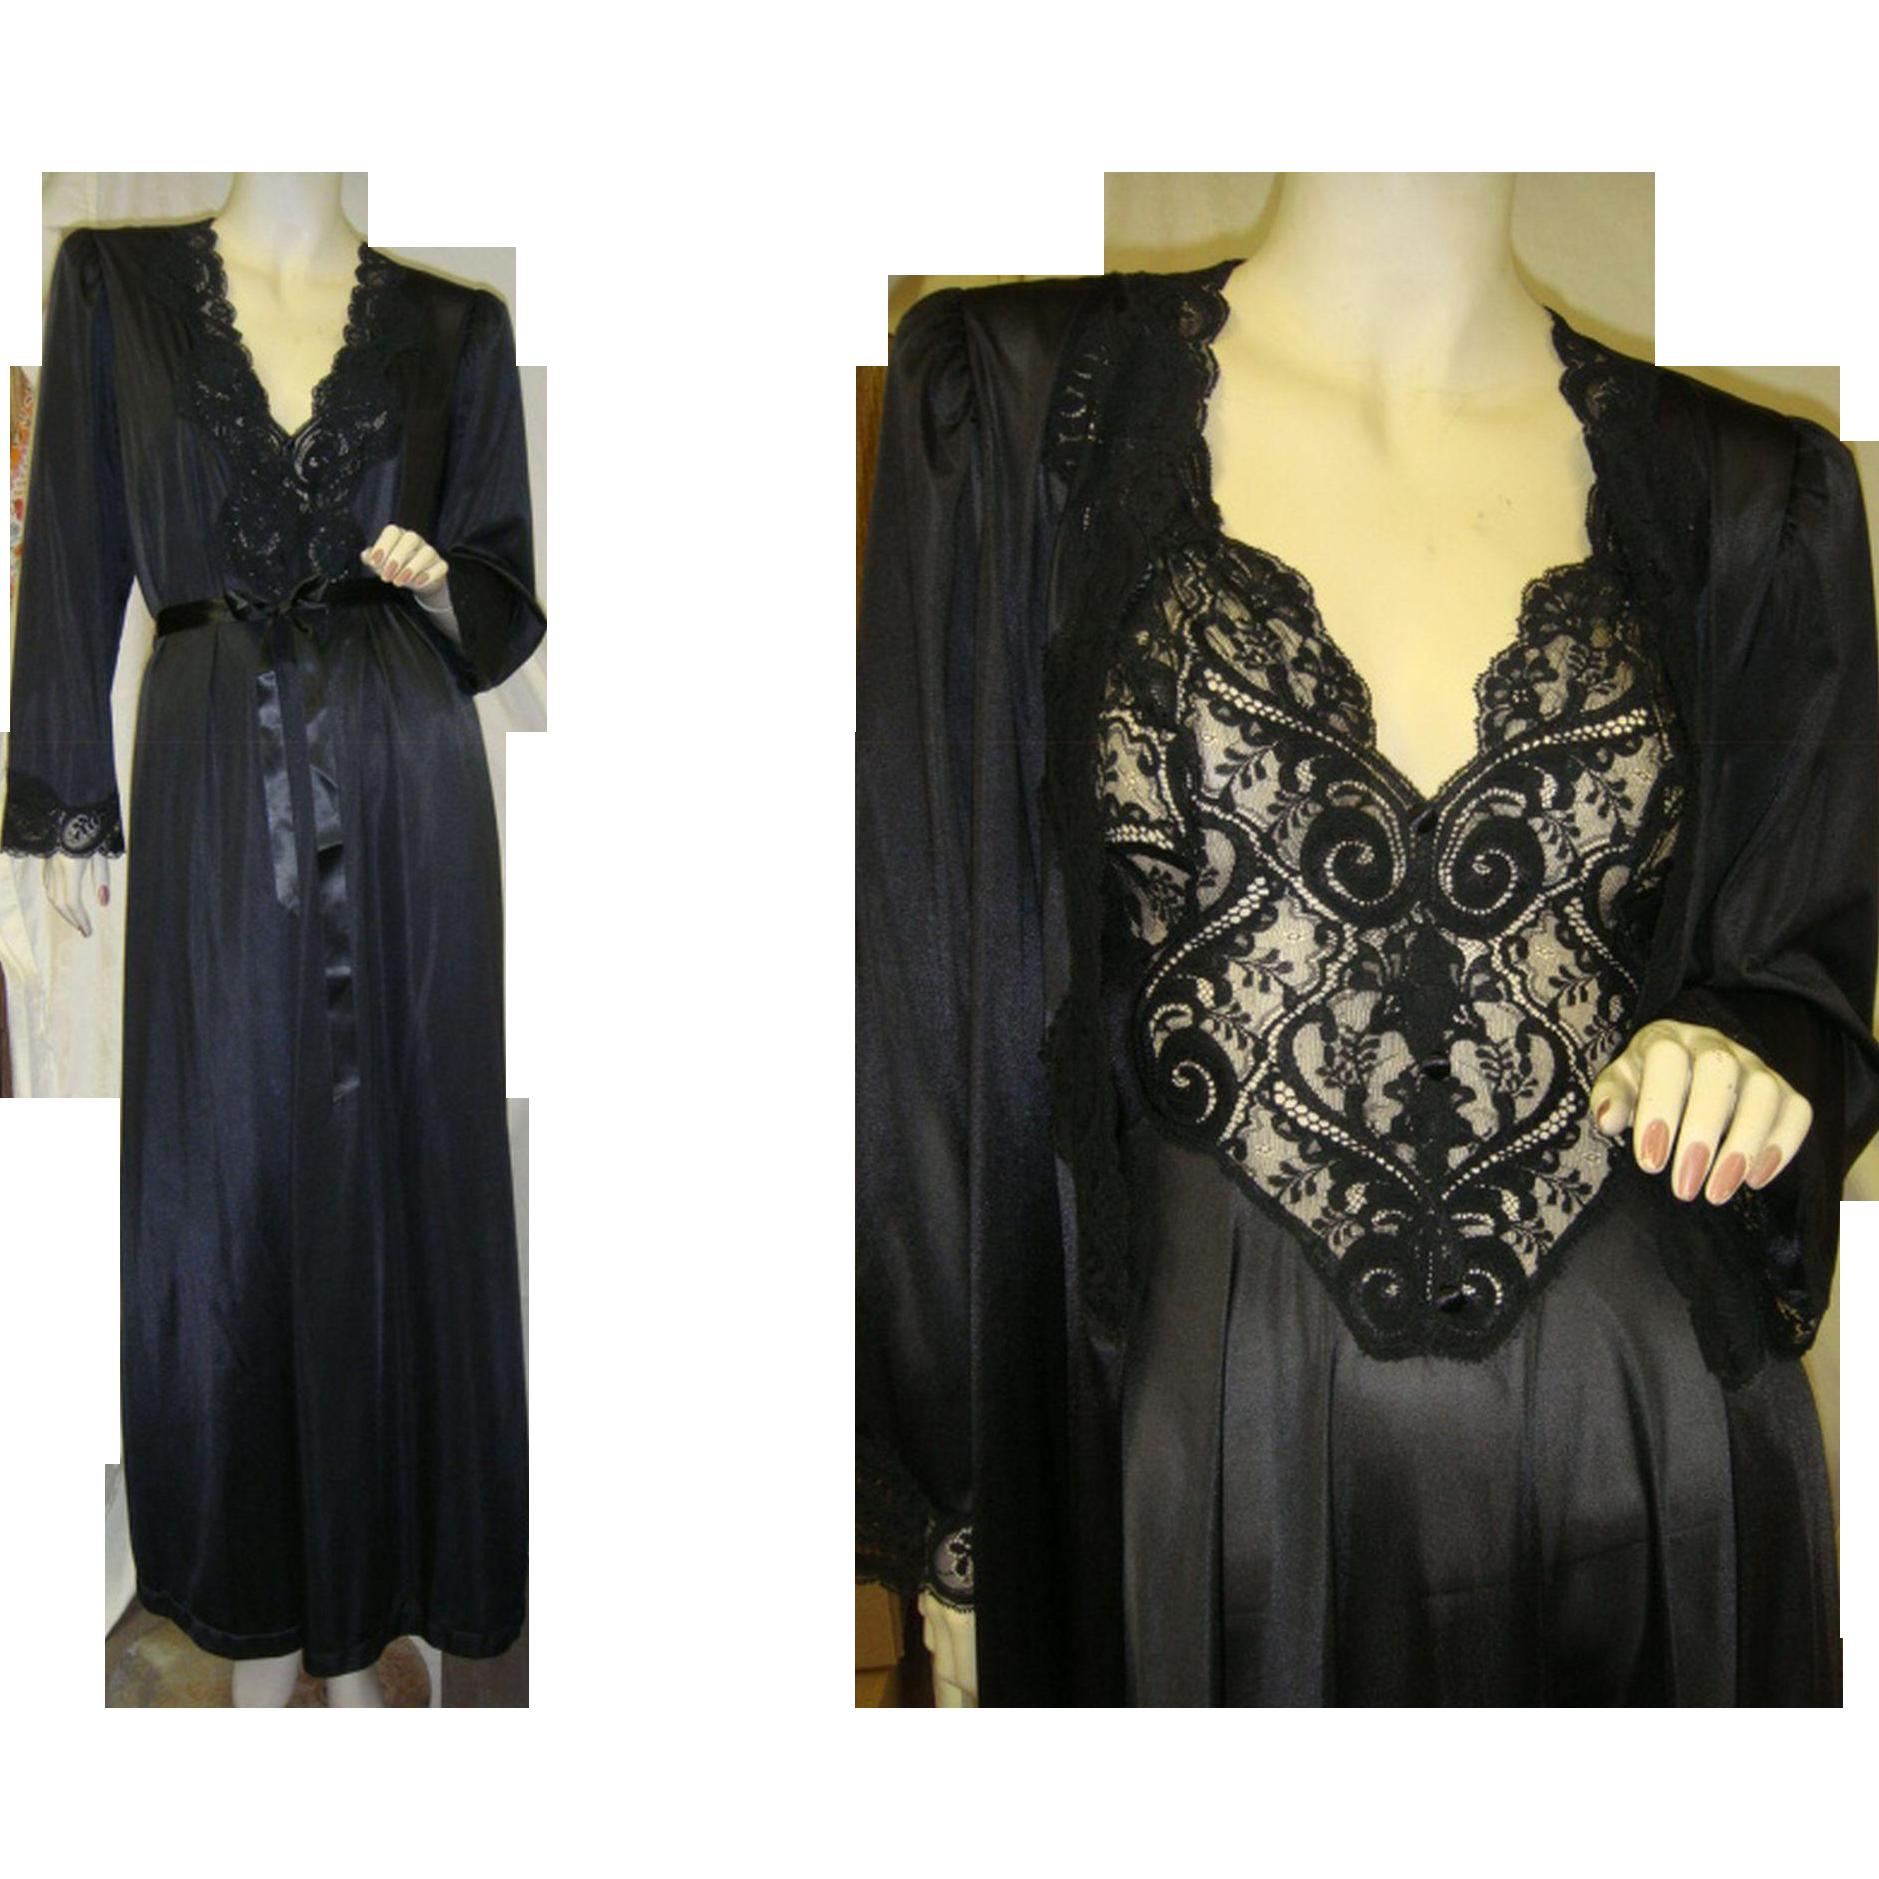 Rare Olga Nightgown Peignoir Robe Set in Black